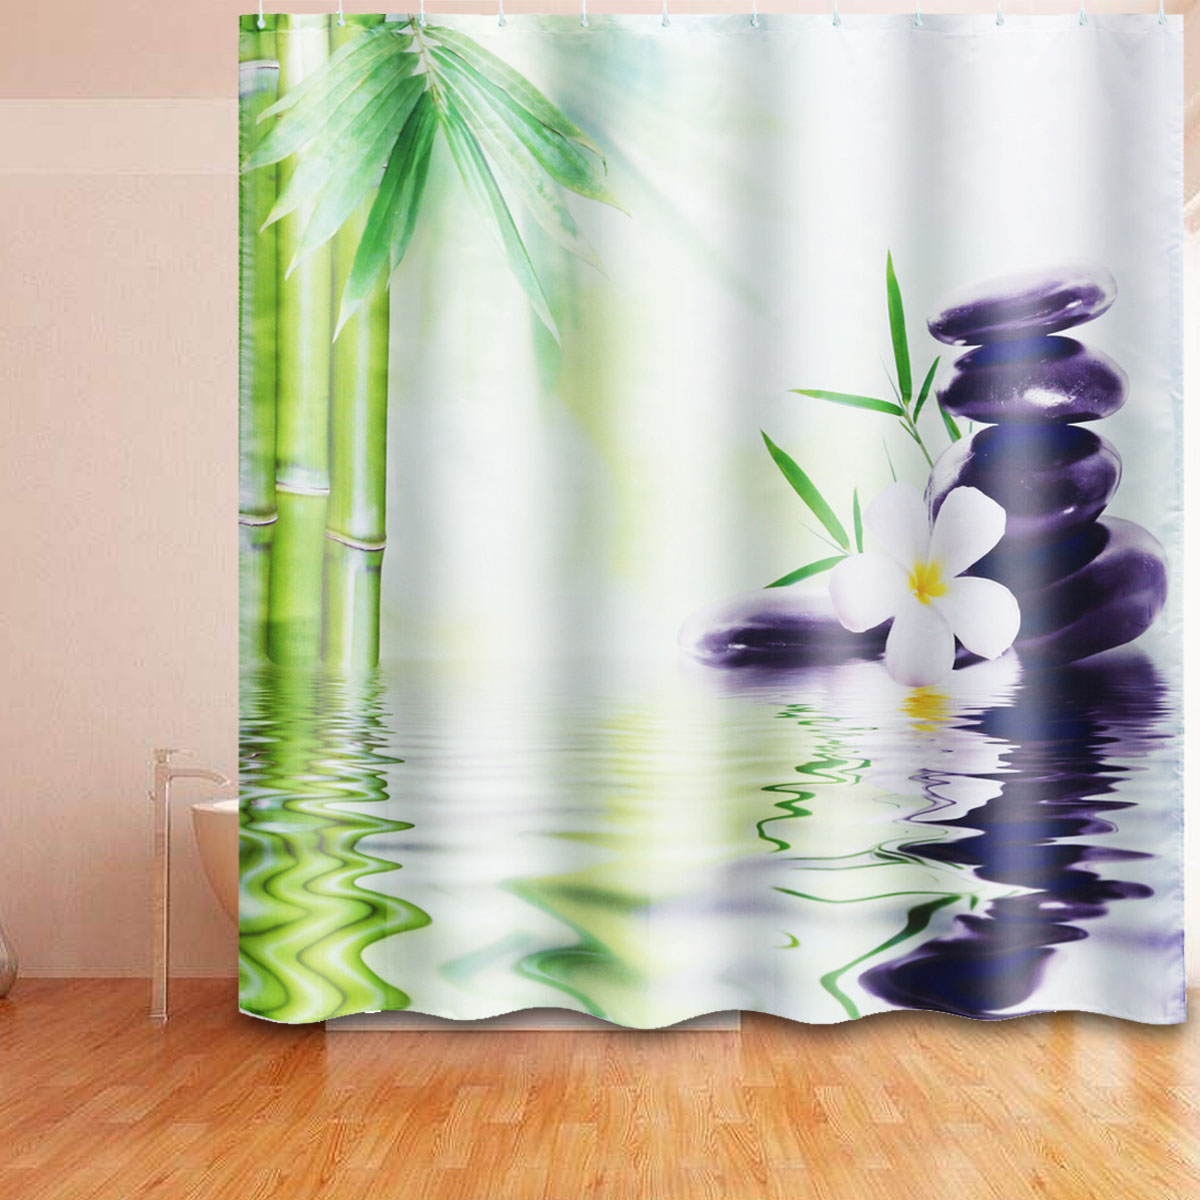 Chinese Style Shower Curtain Bamboo Bathroom Curtain